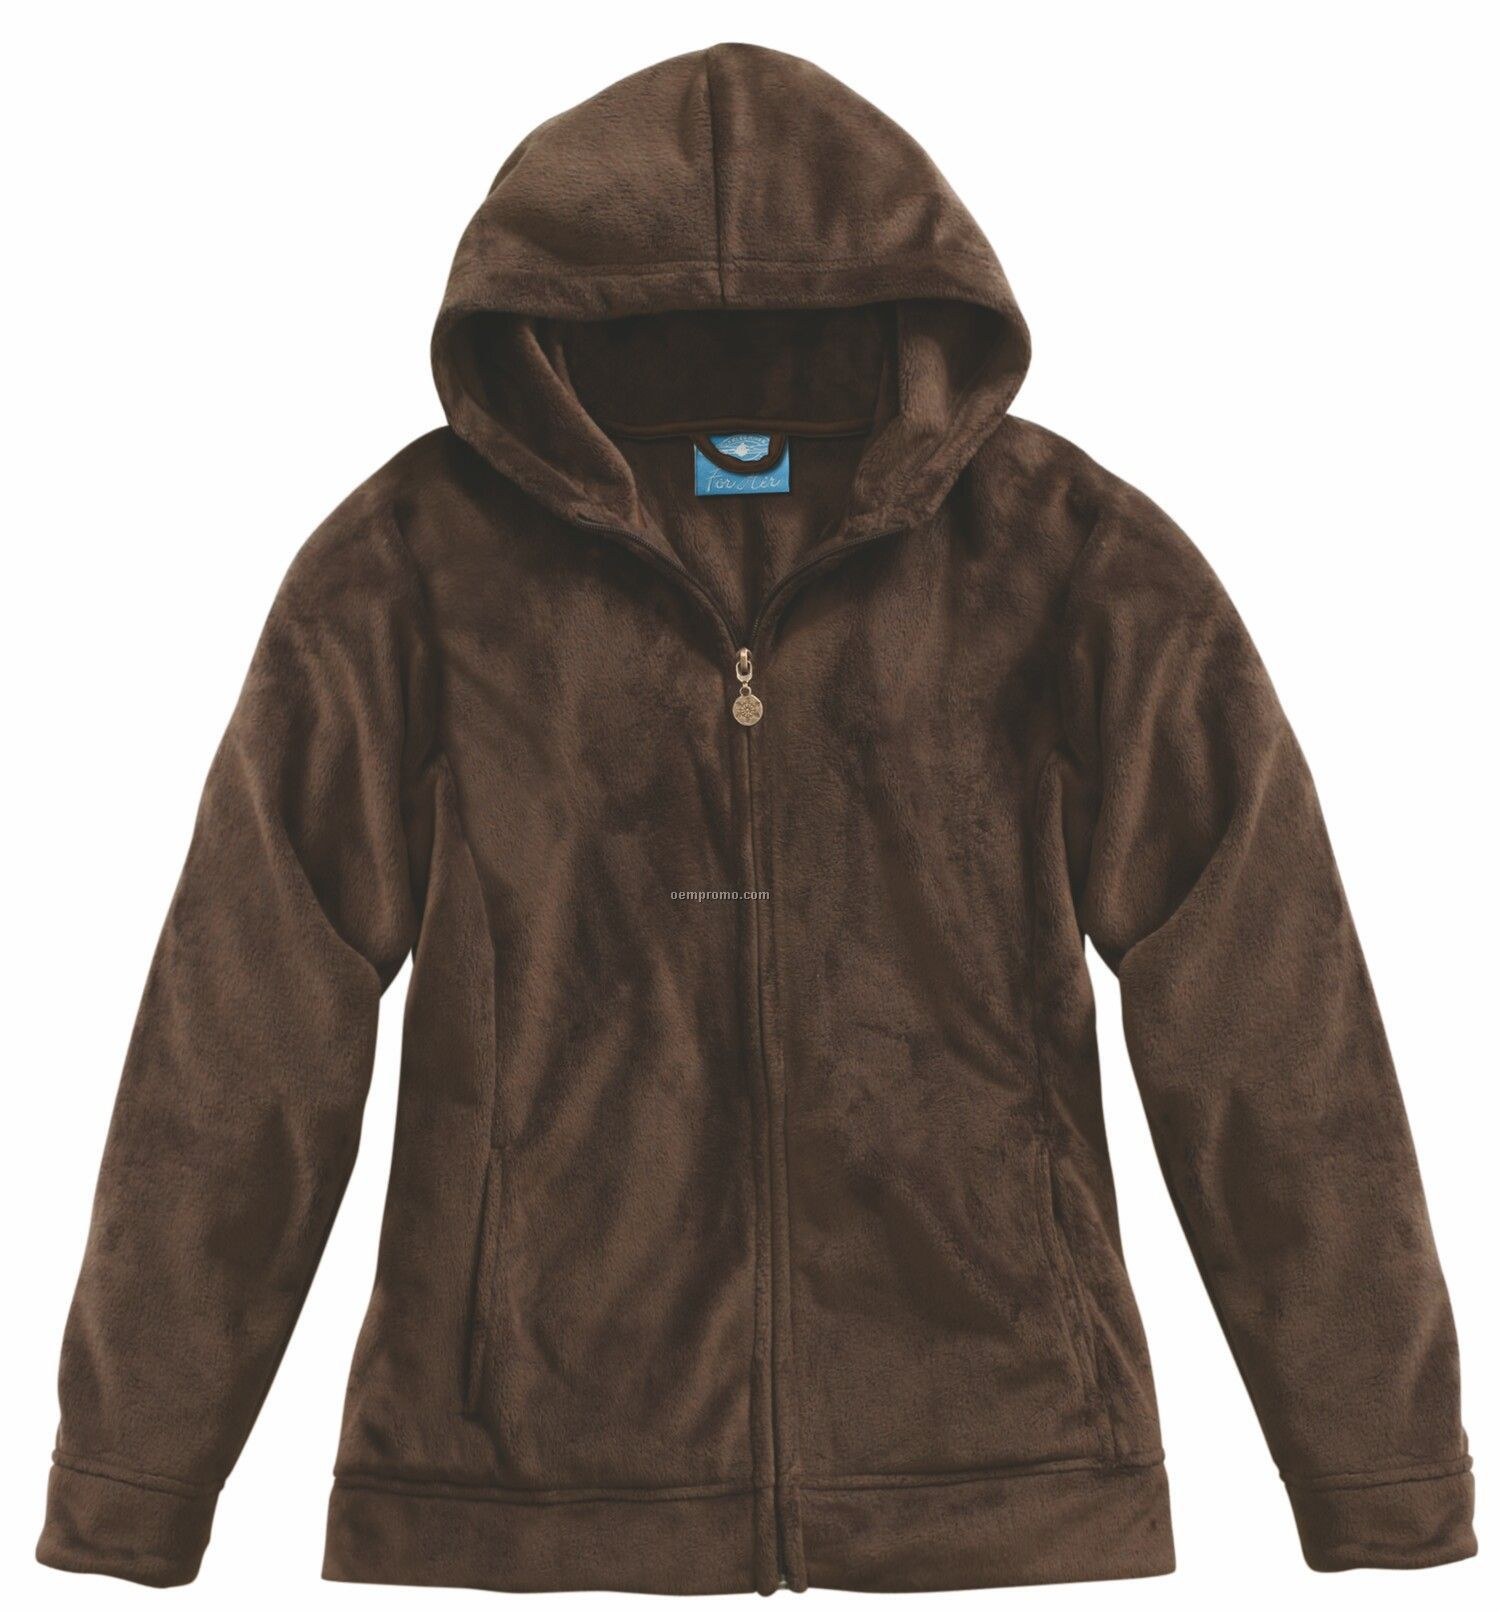 Women's Silken Fleece Jacket,China Wholesale Women's Silken Fleece